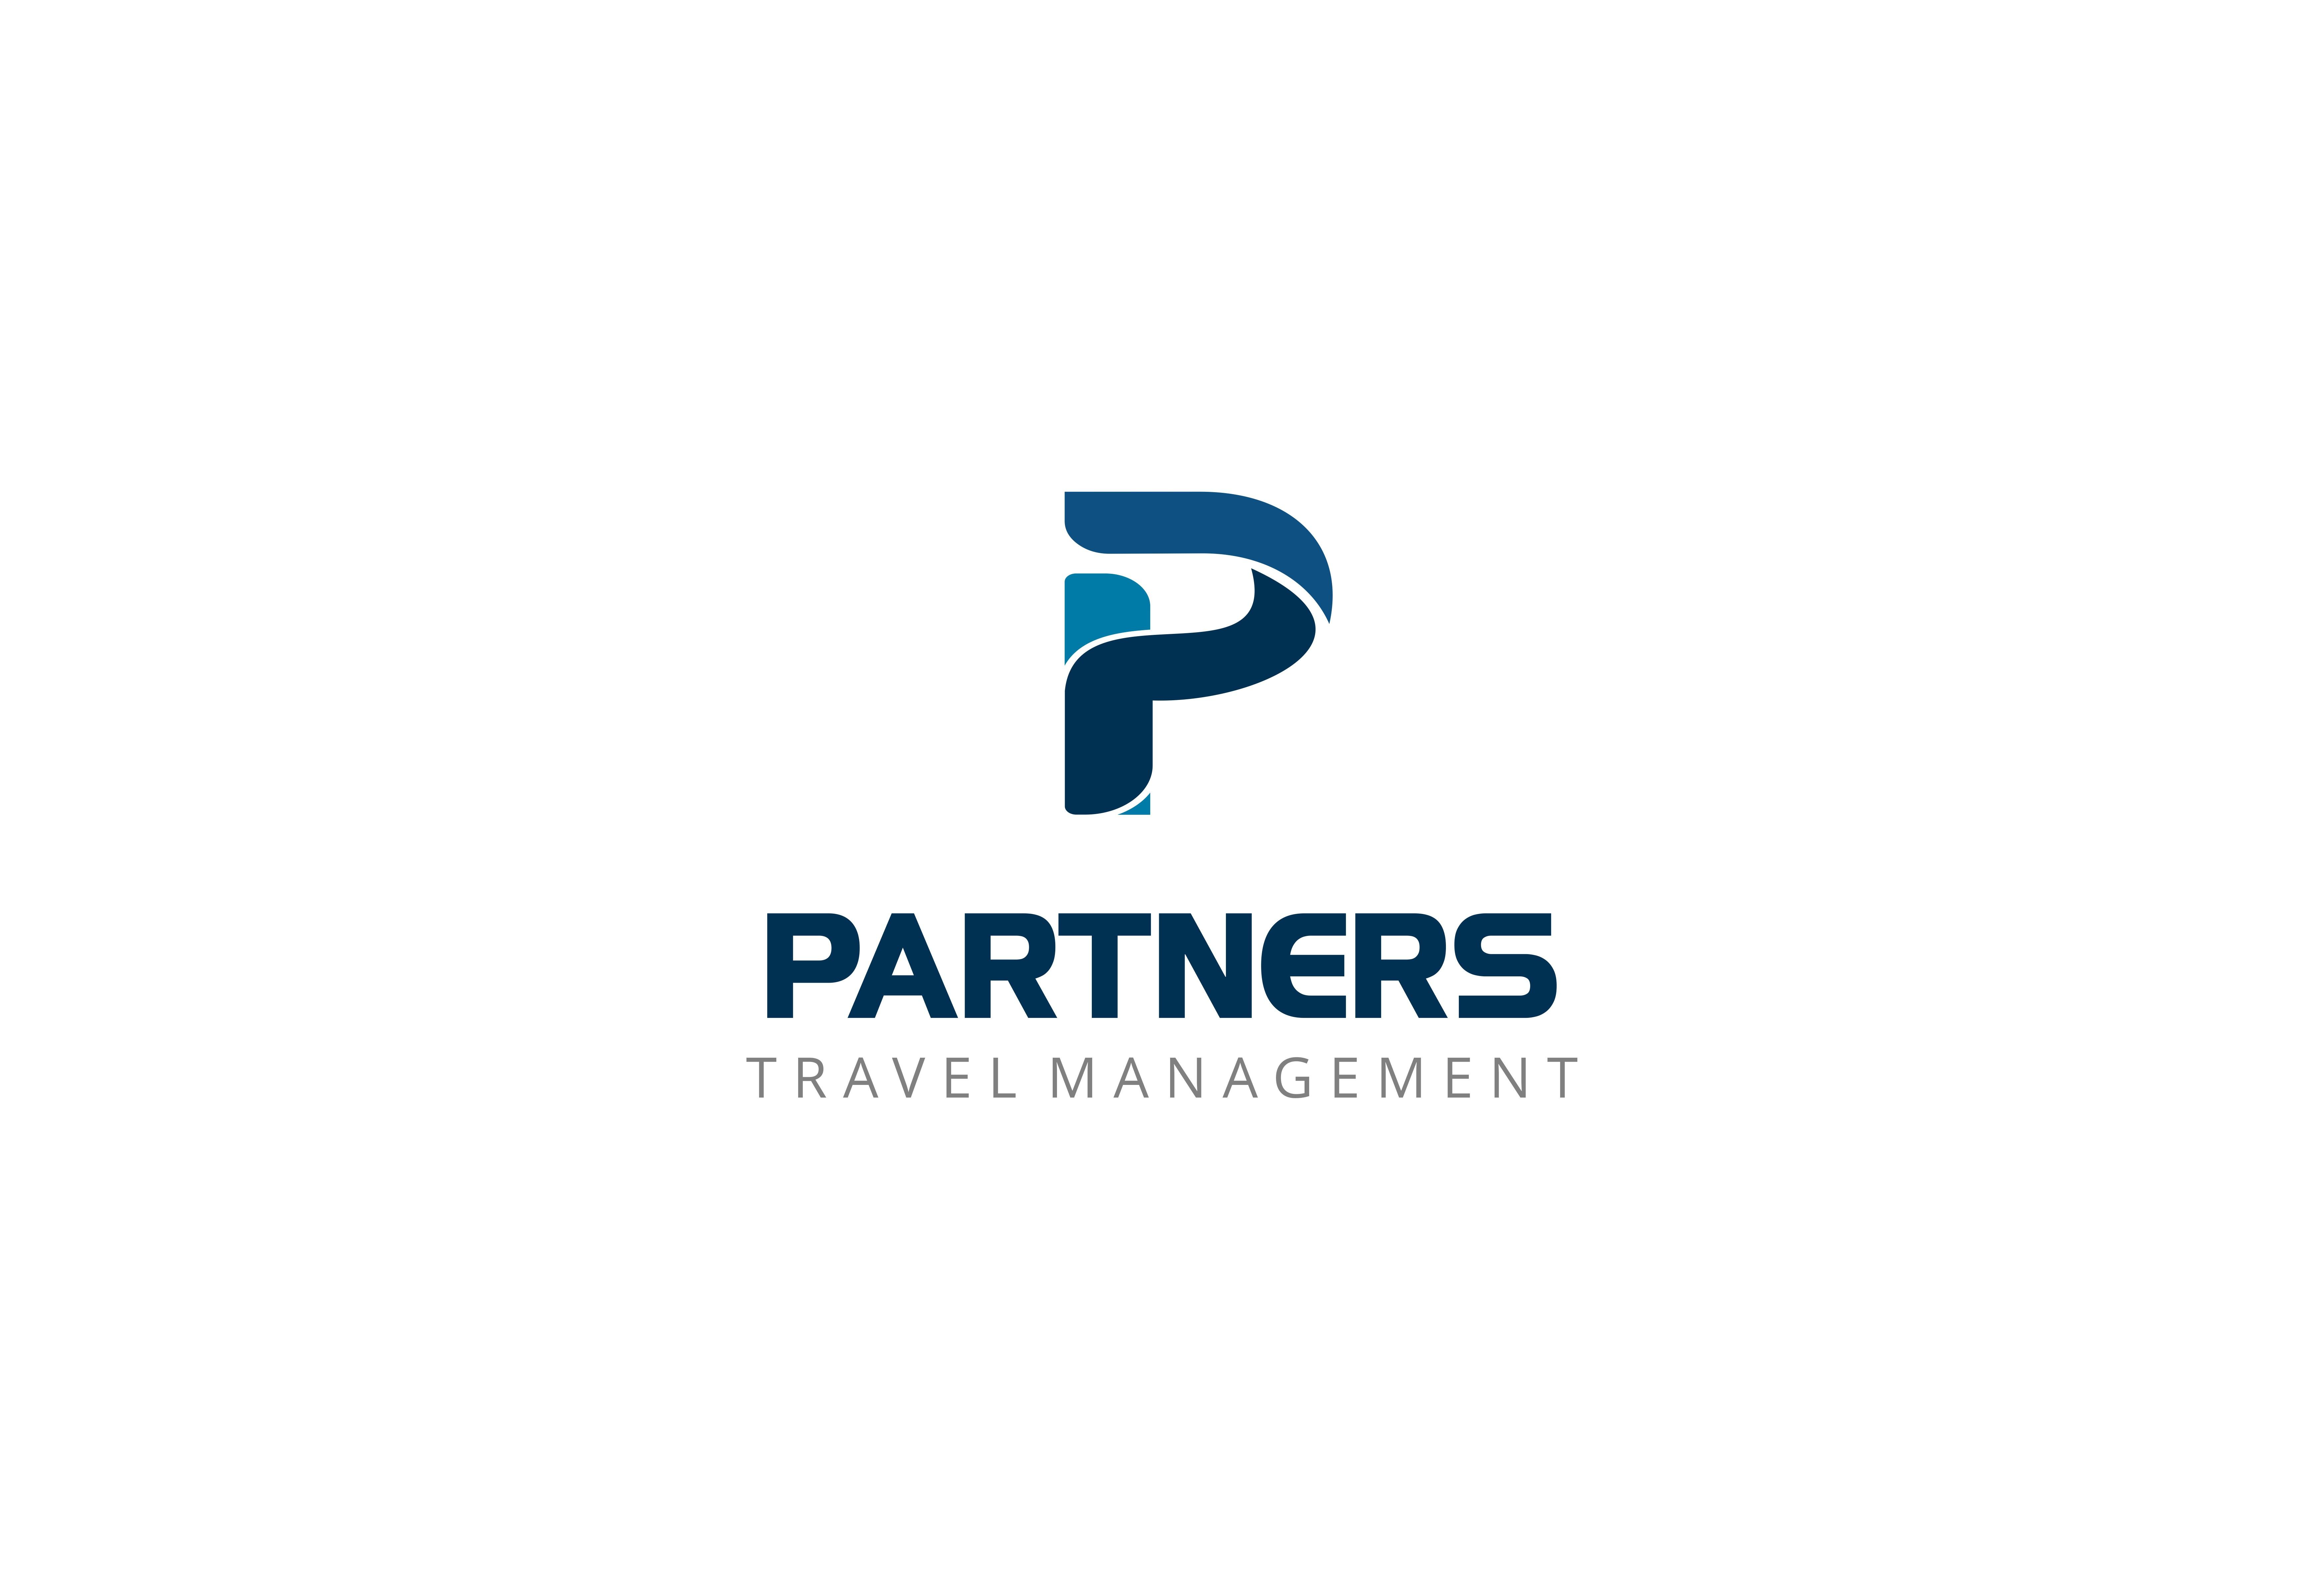 New era: Partners Travel Management